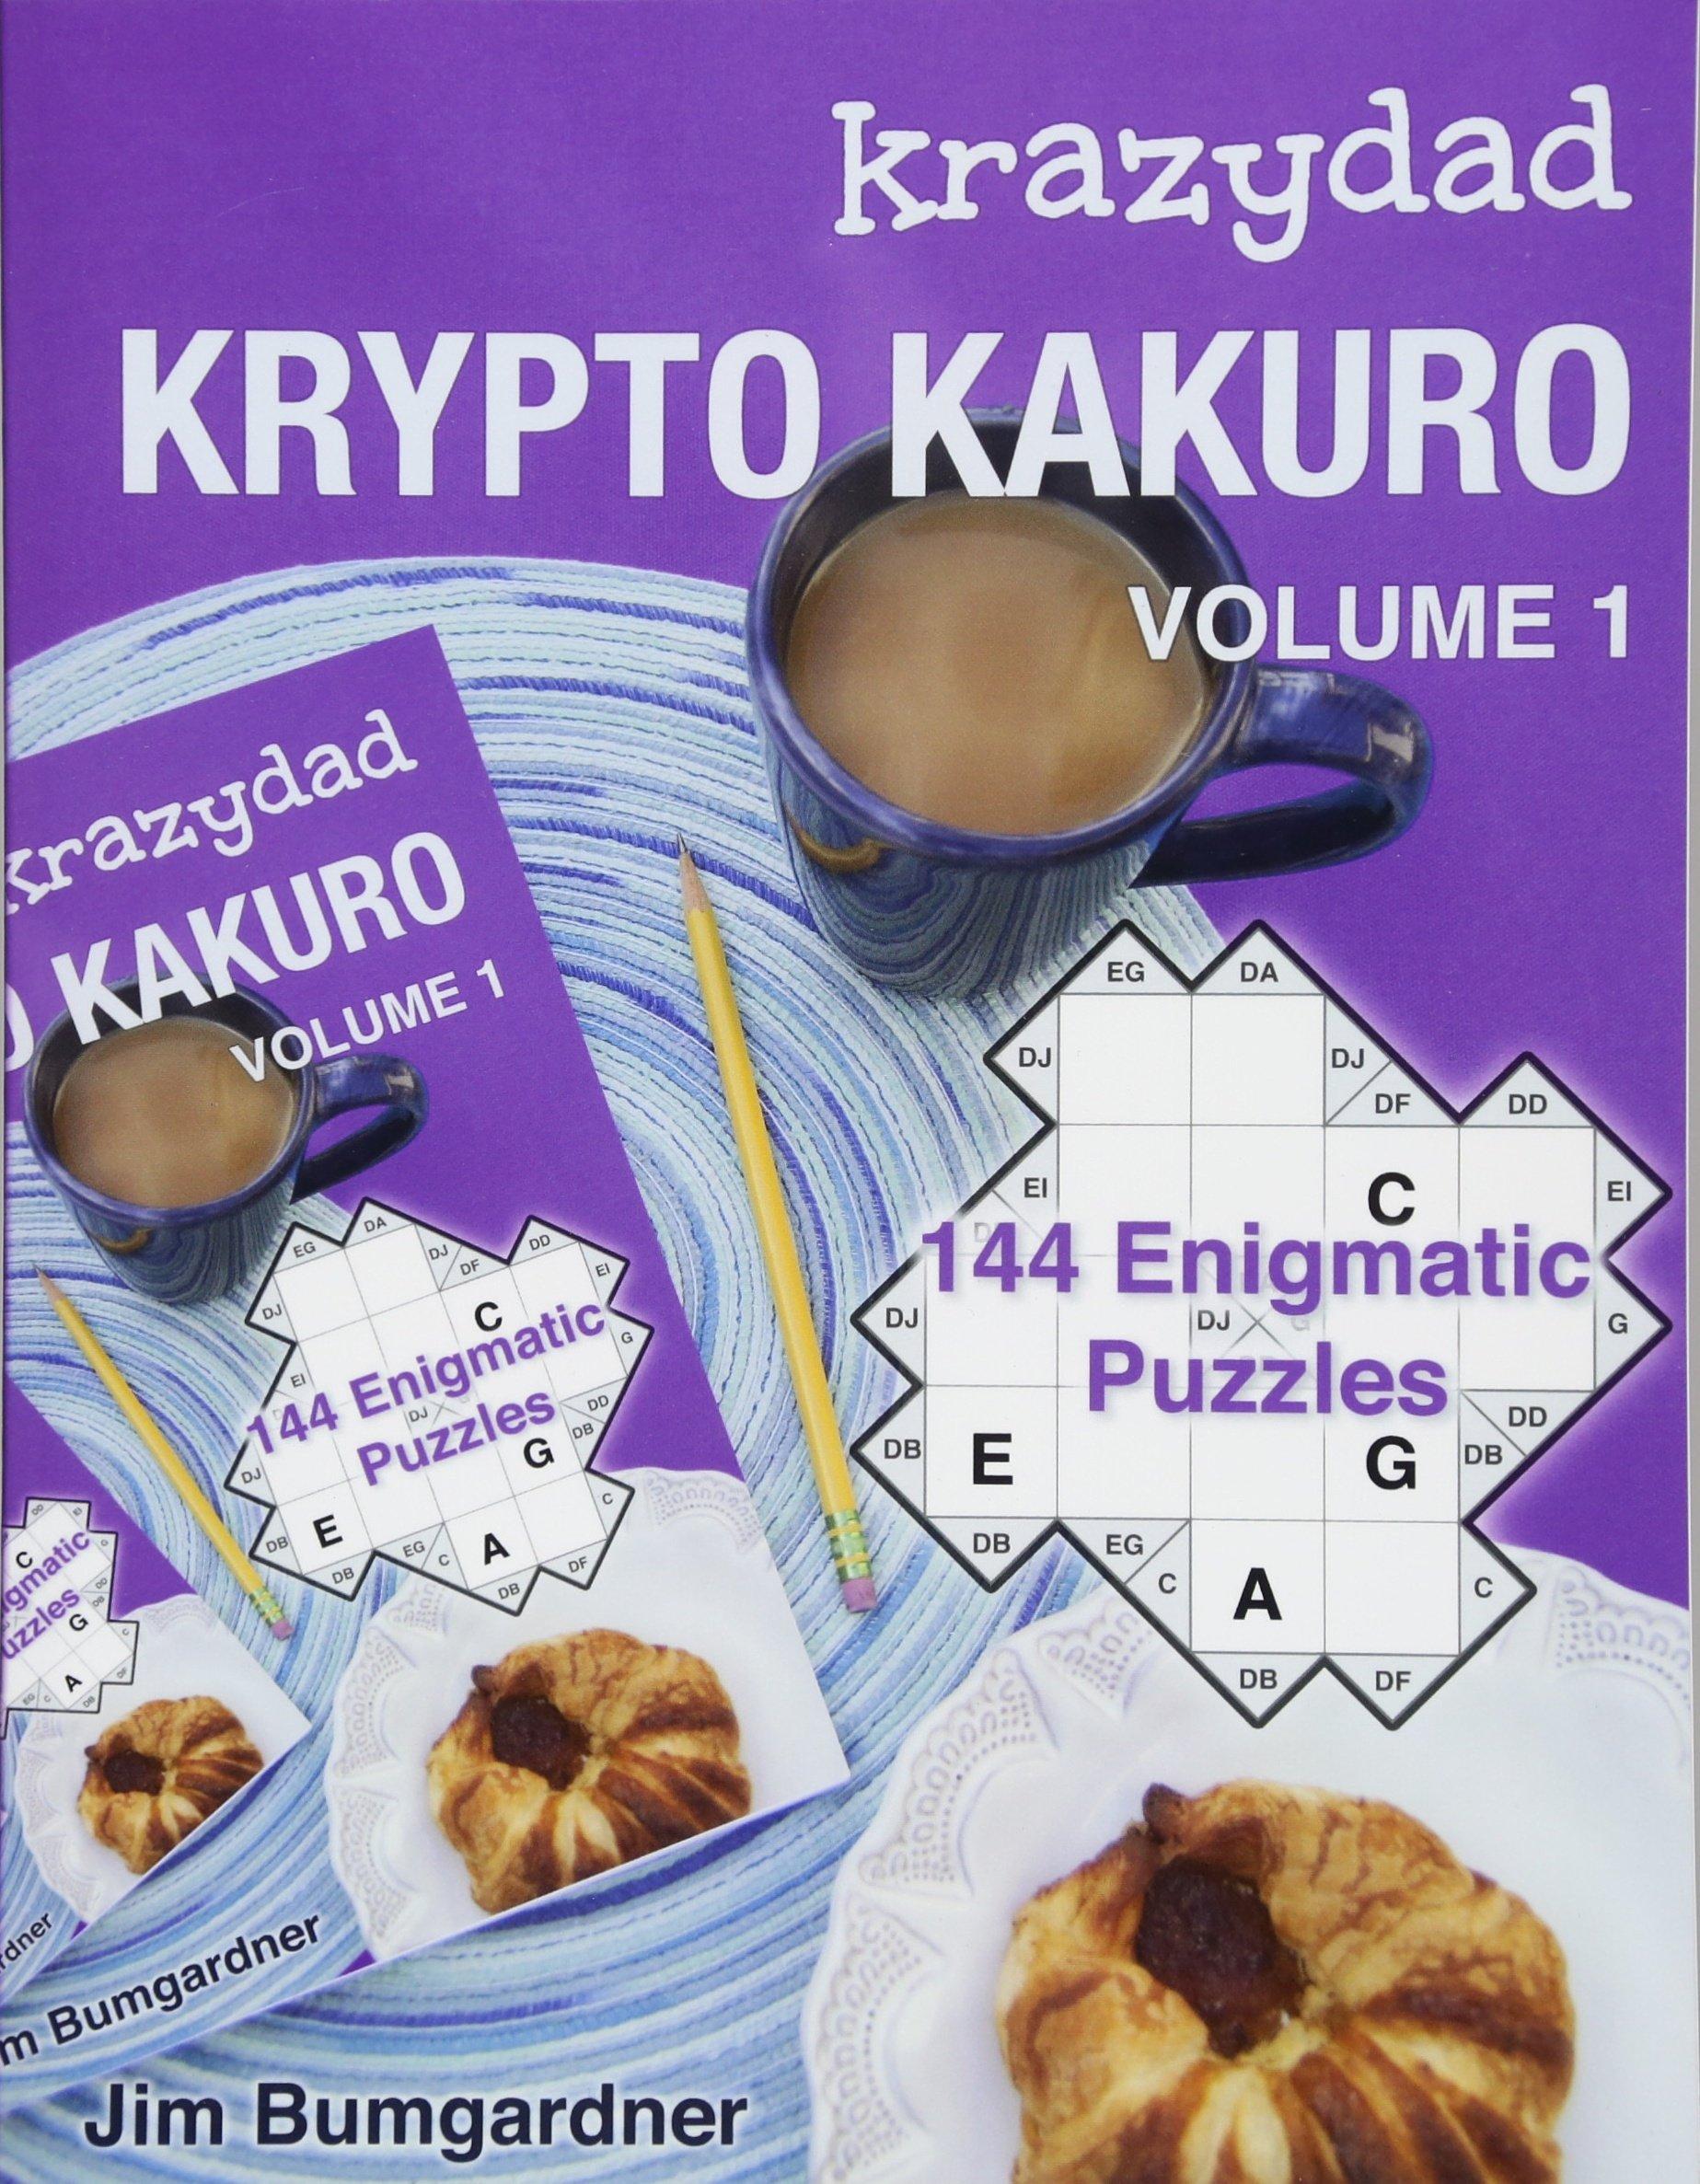 graphic about Krazydad Printable Sudoku titled Krazydad Krypto Kakuro Sum 1: 144 Enigmatic Puzzles: Jim